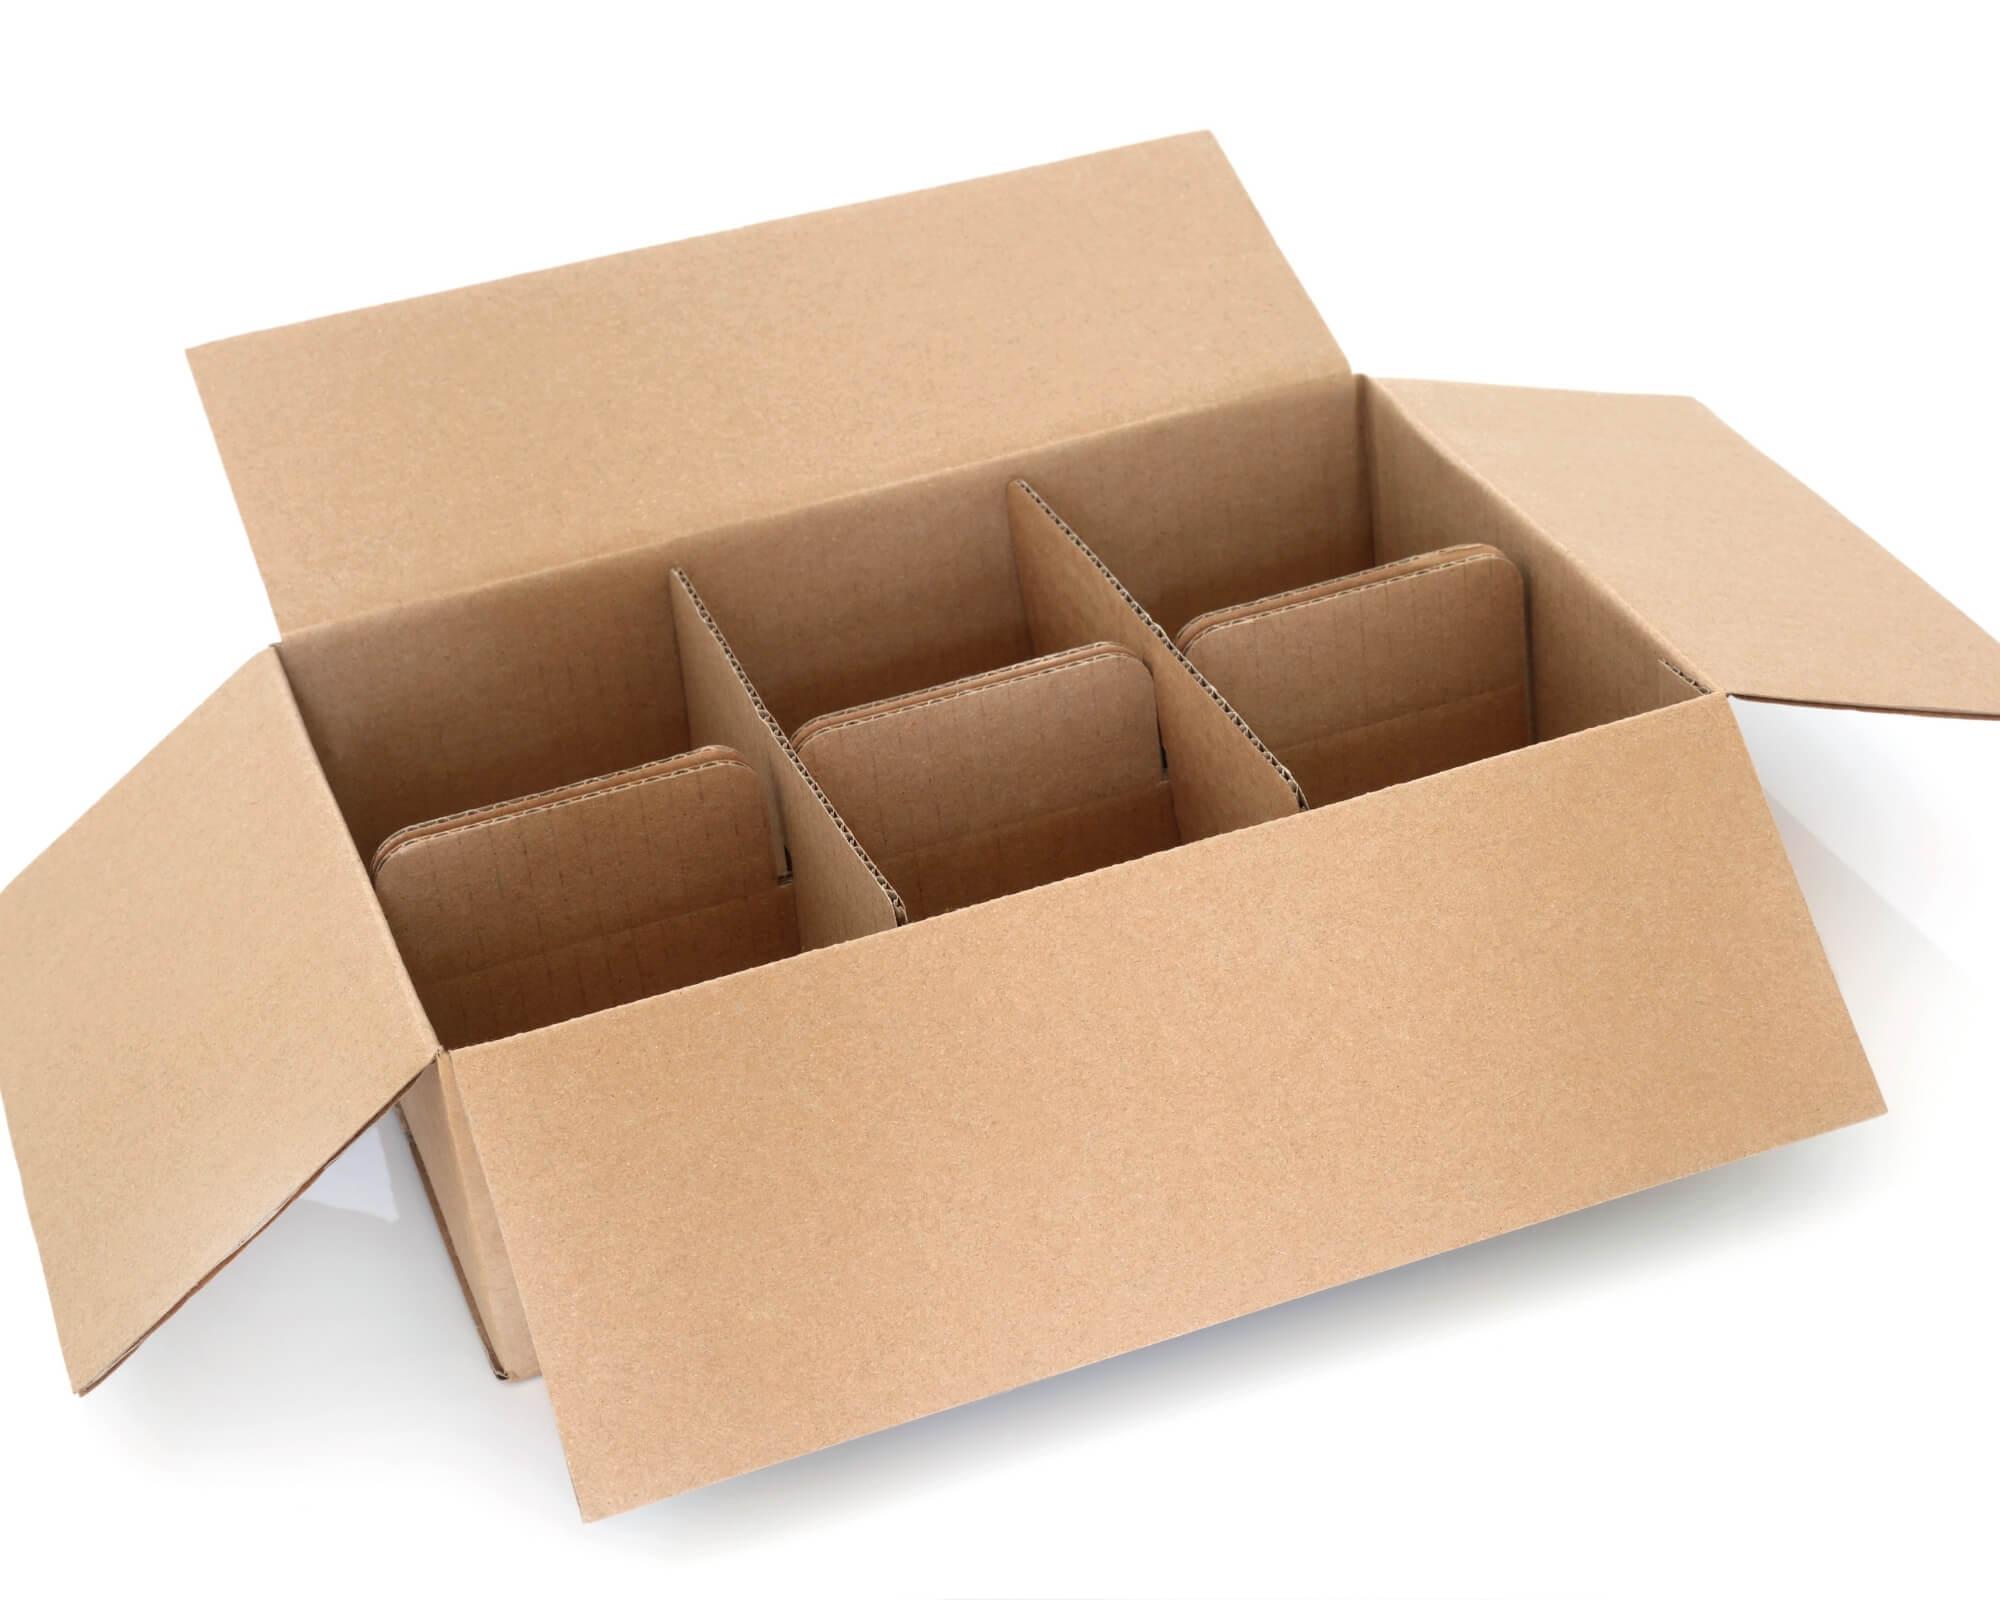 cajas con compartimentos de cartón